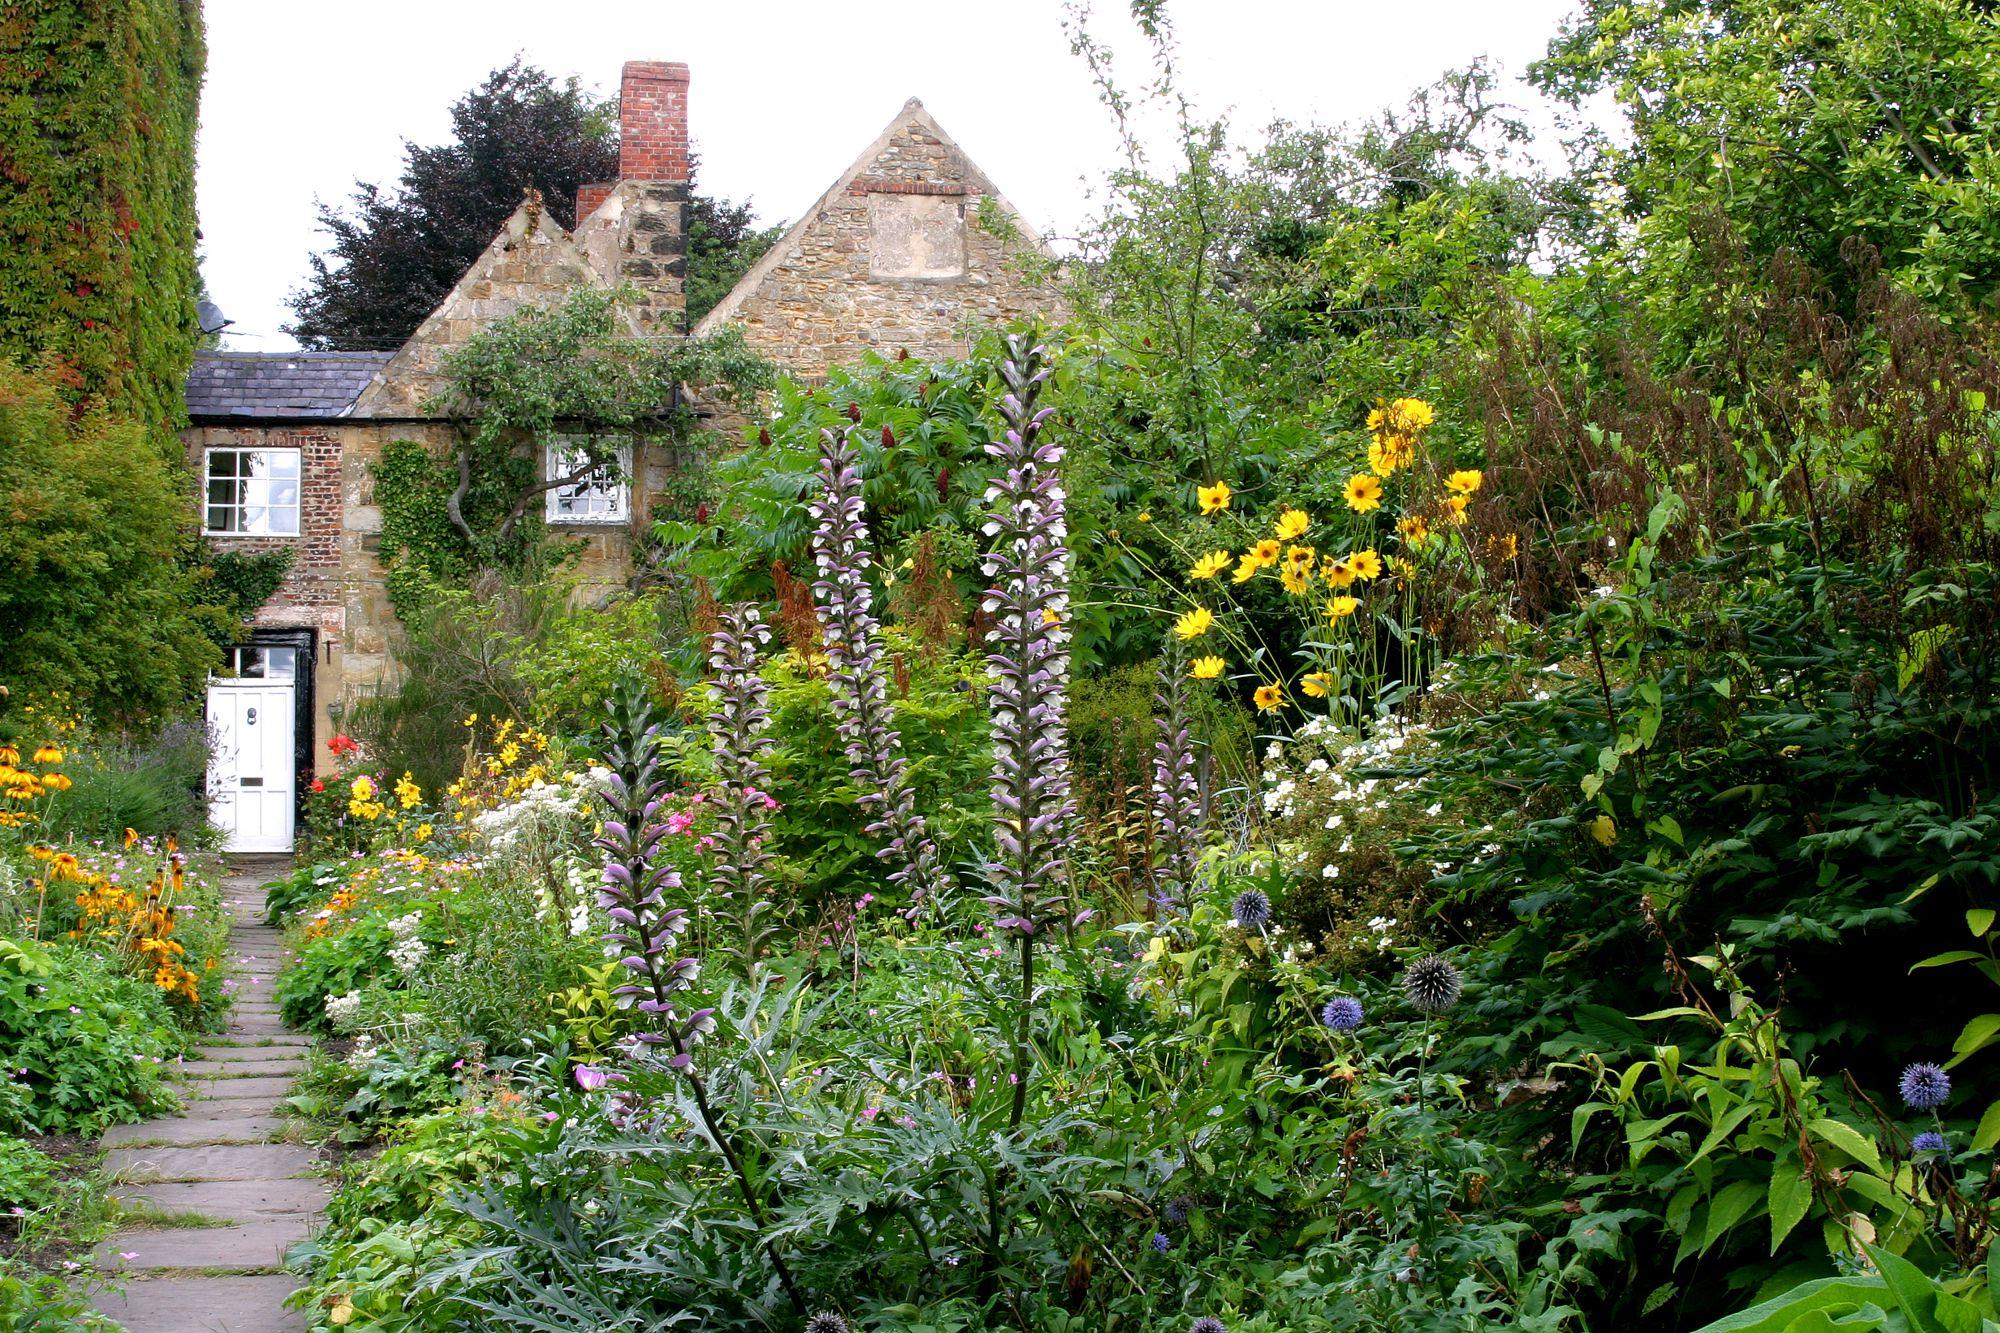 Crook Hall and Gardens